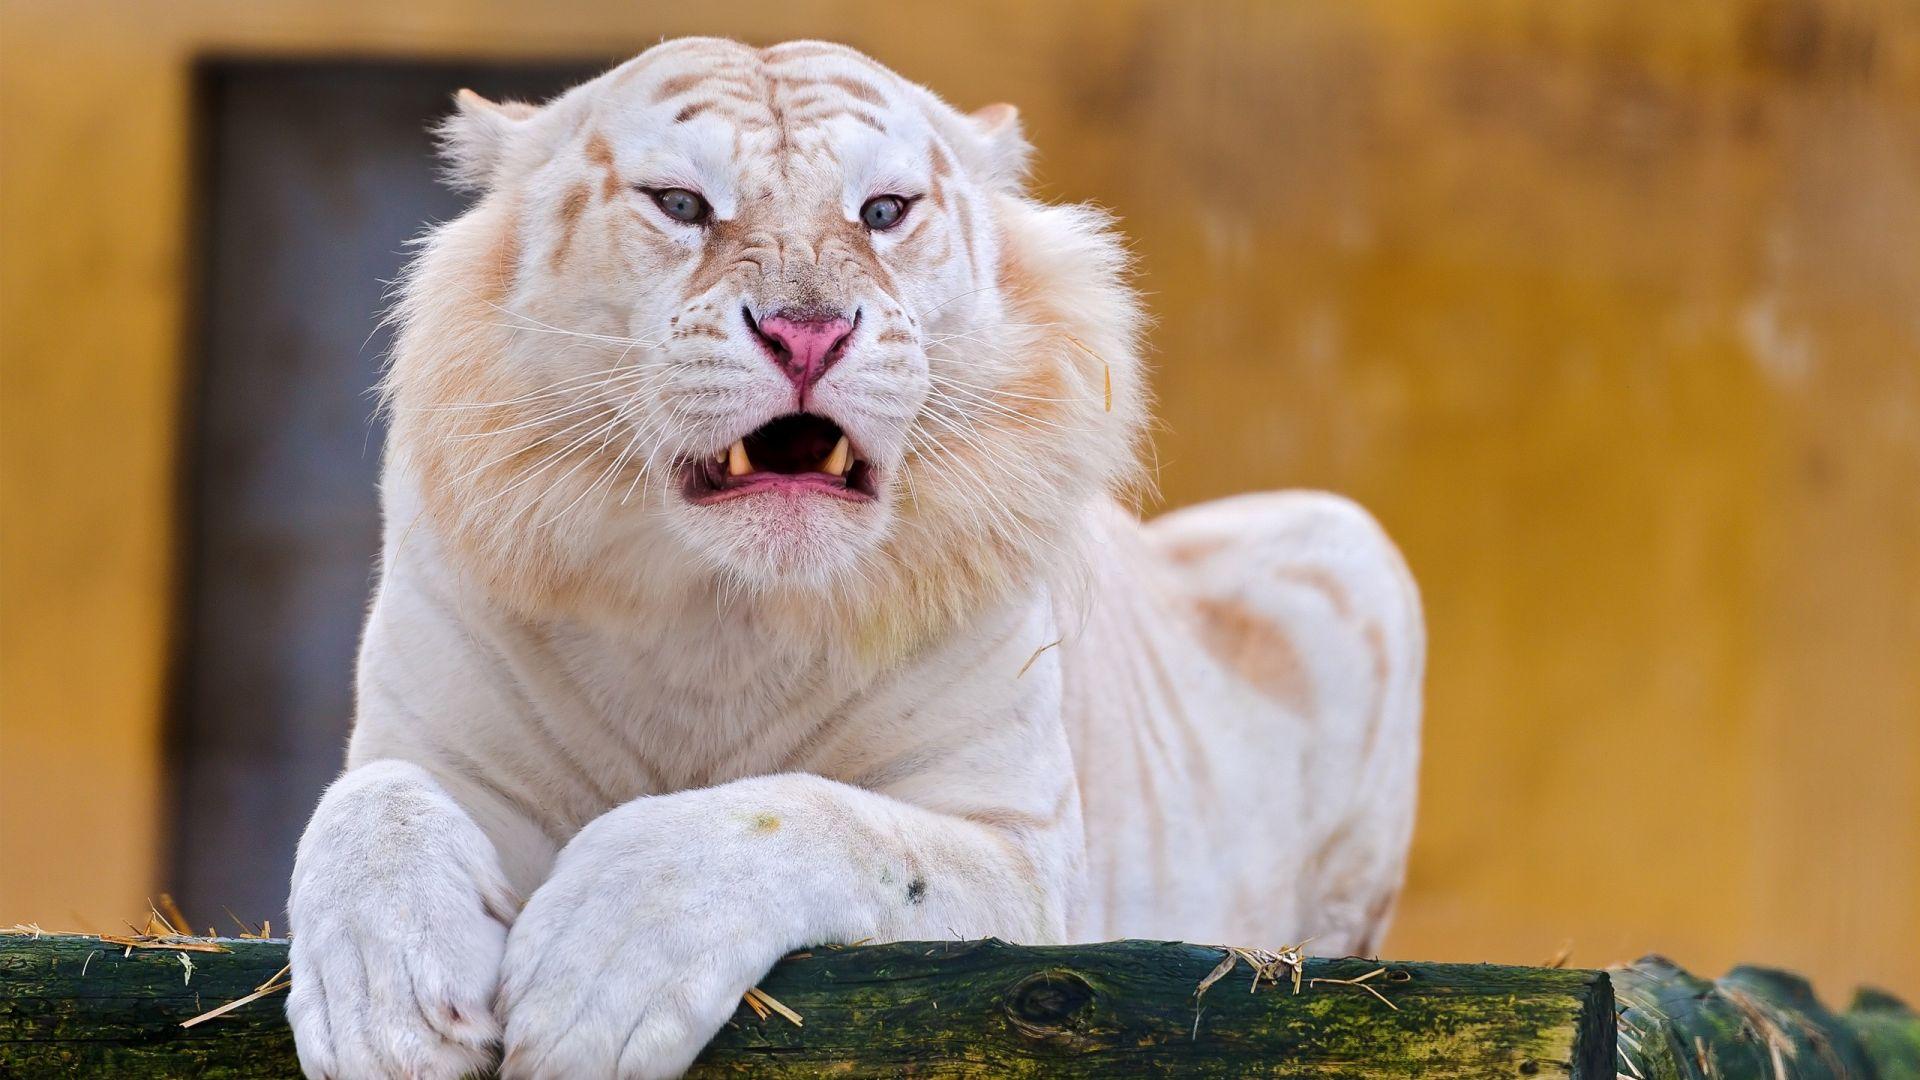 White Tiger, Cool Wallpaper